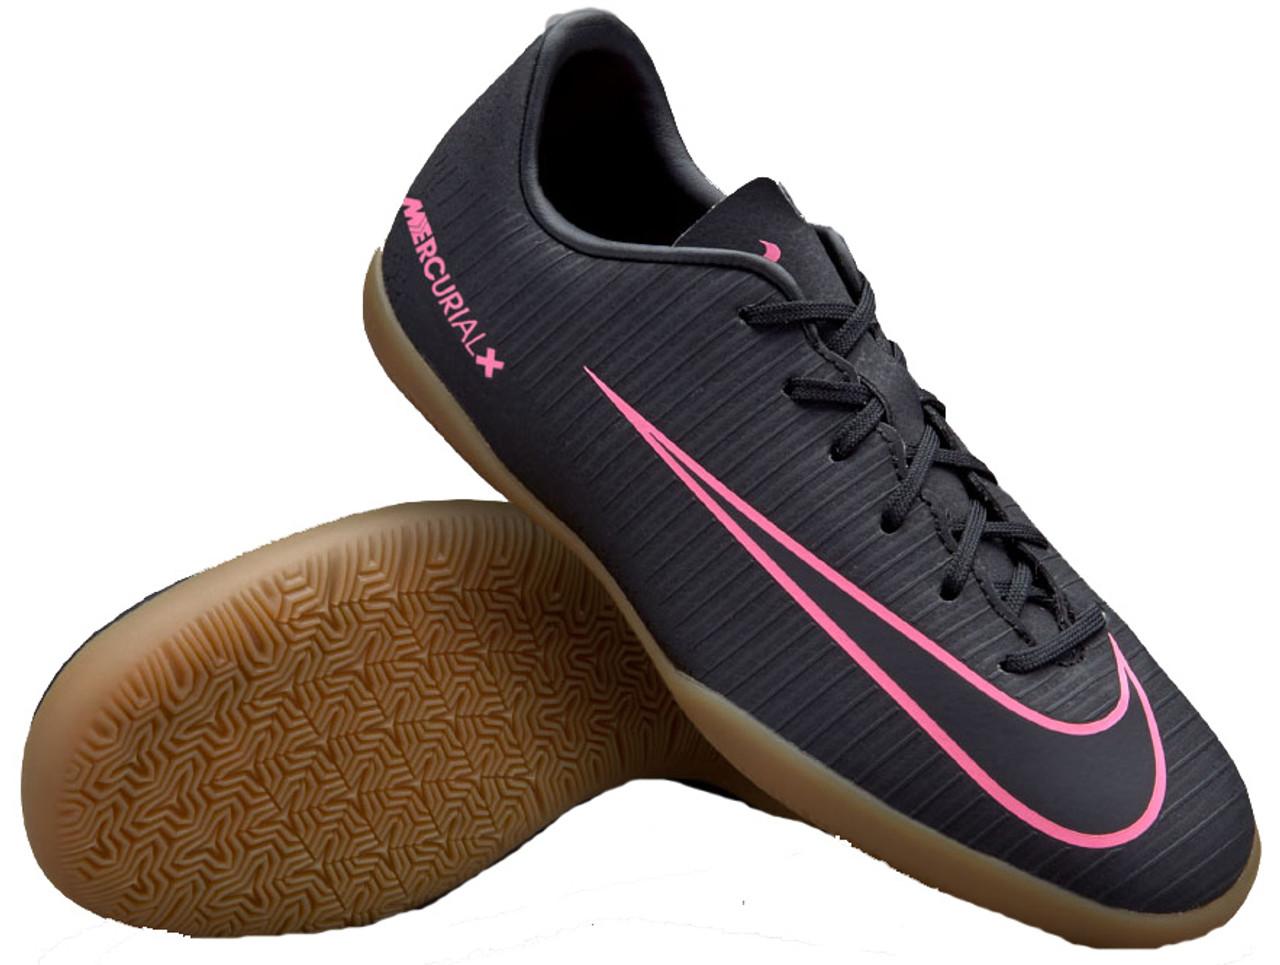 f68783843 NIKE JR MERCURIALX VAPOR XI boys indoor soccer shoes black pink - Soccer  Plus